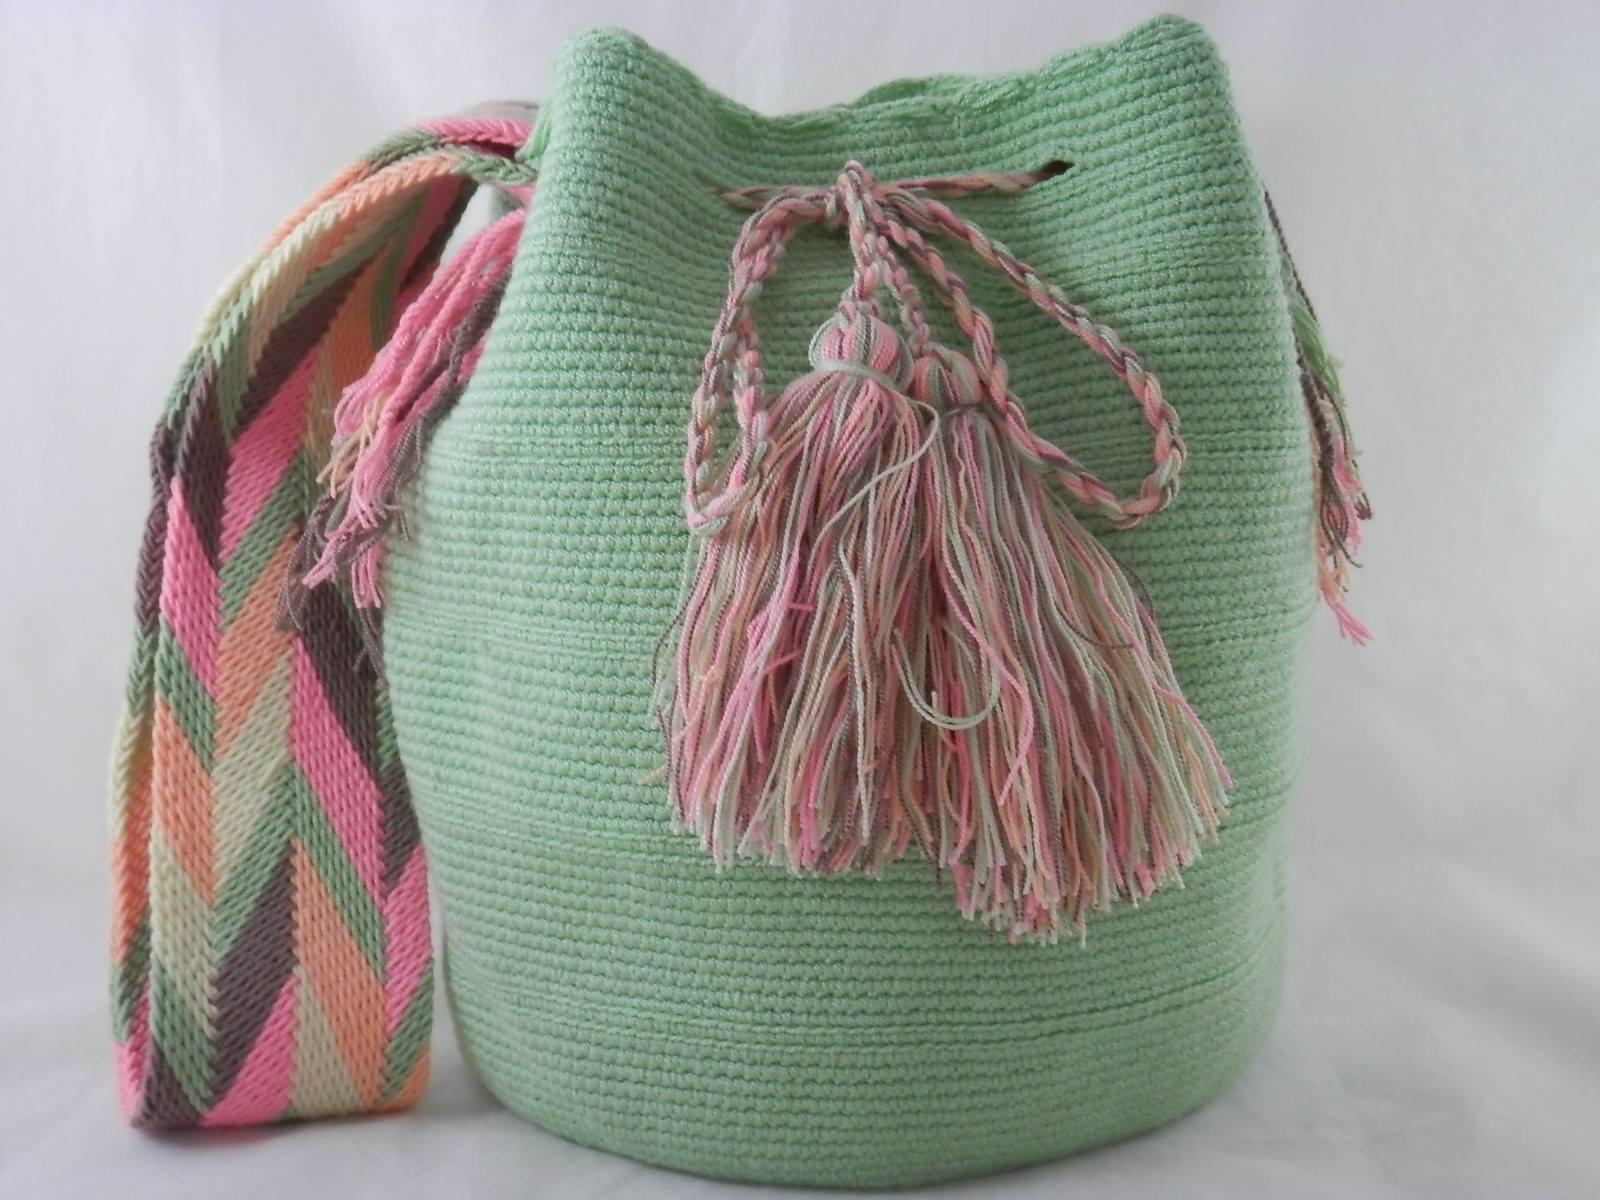 IWayuu Bag by PPS-MG_9235